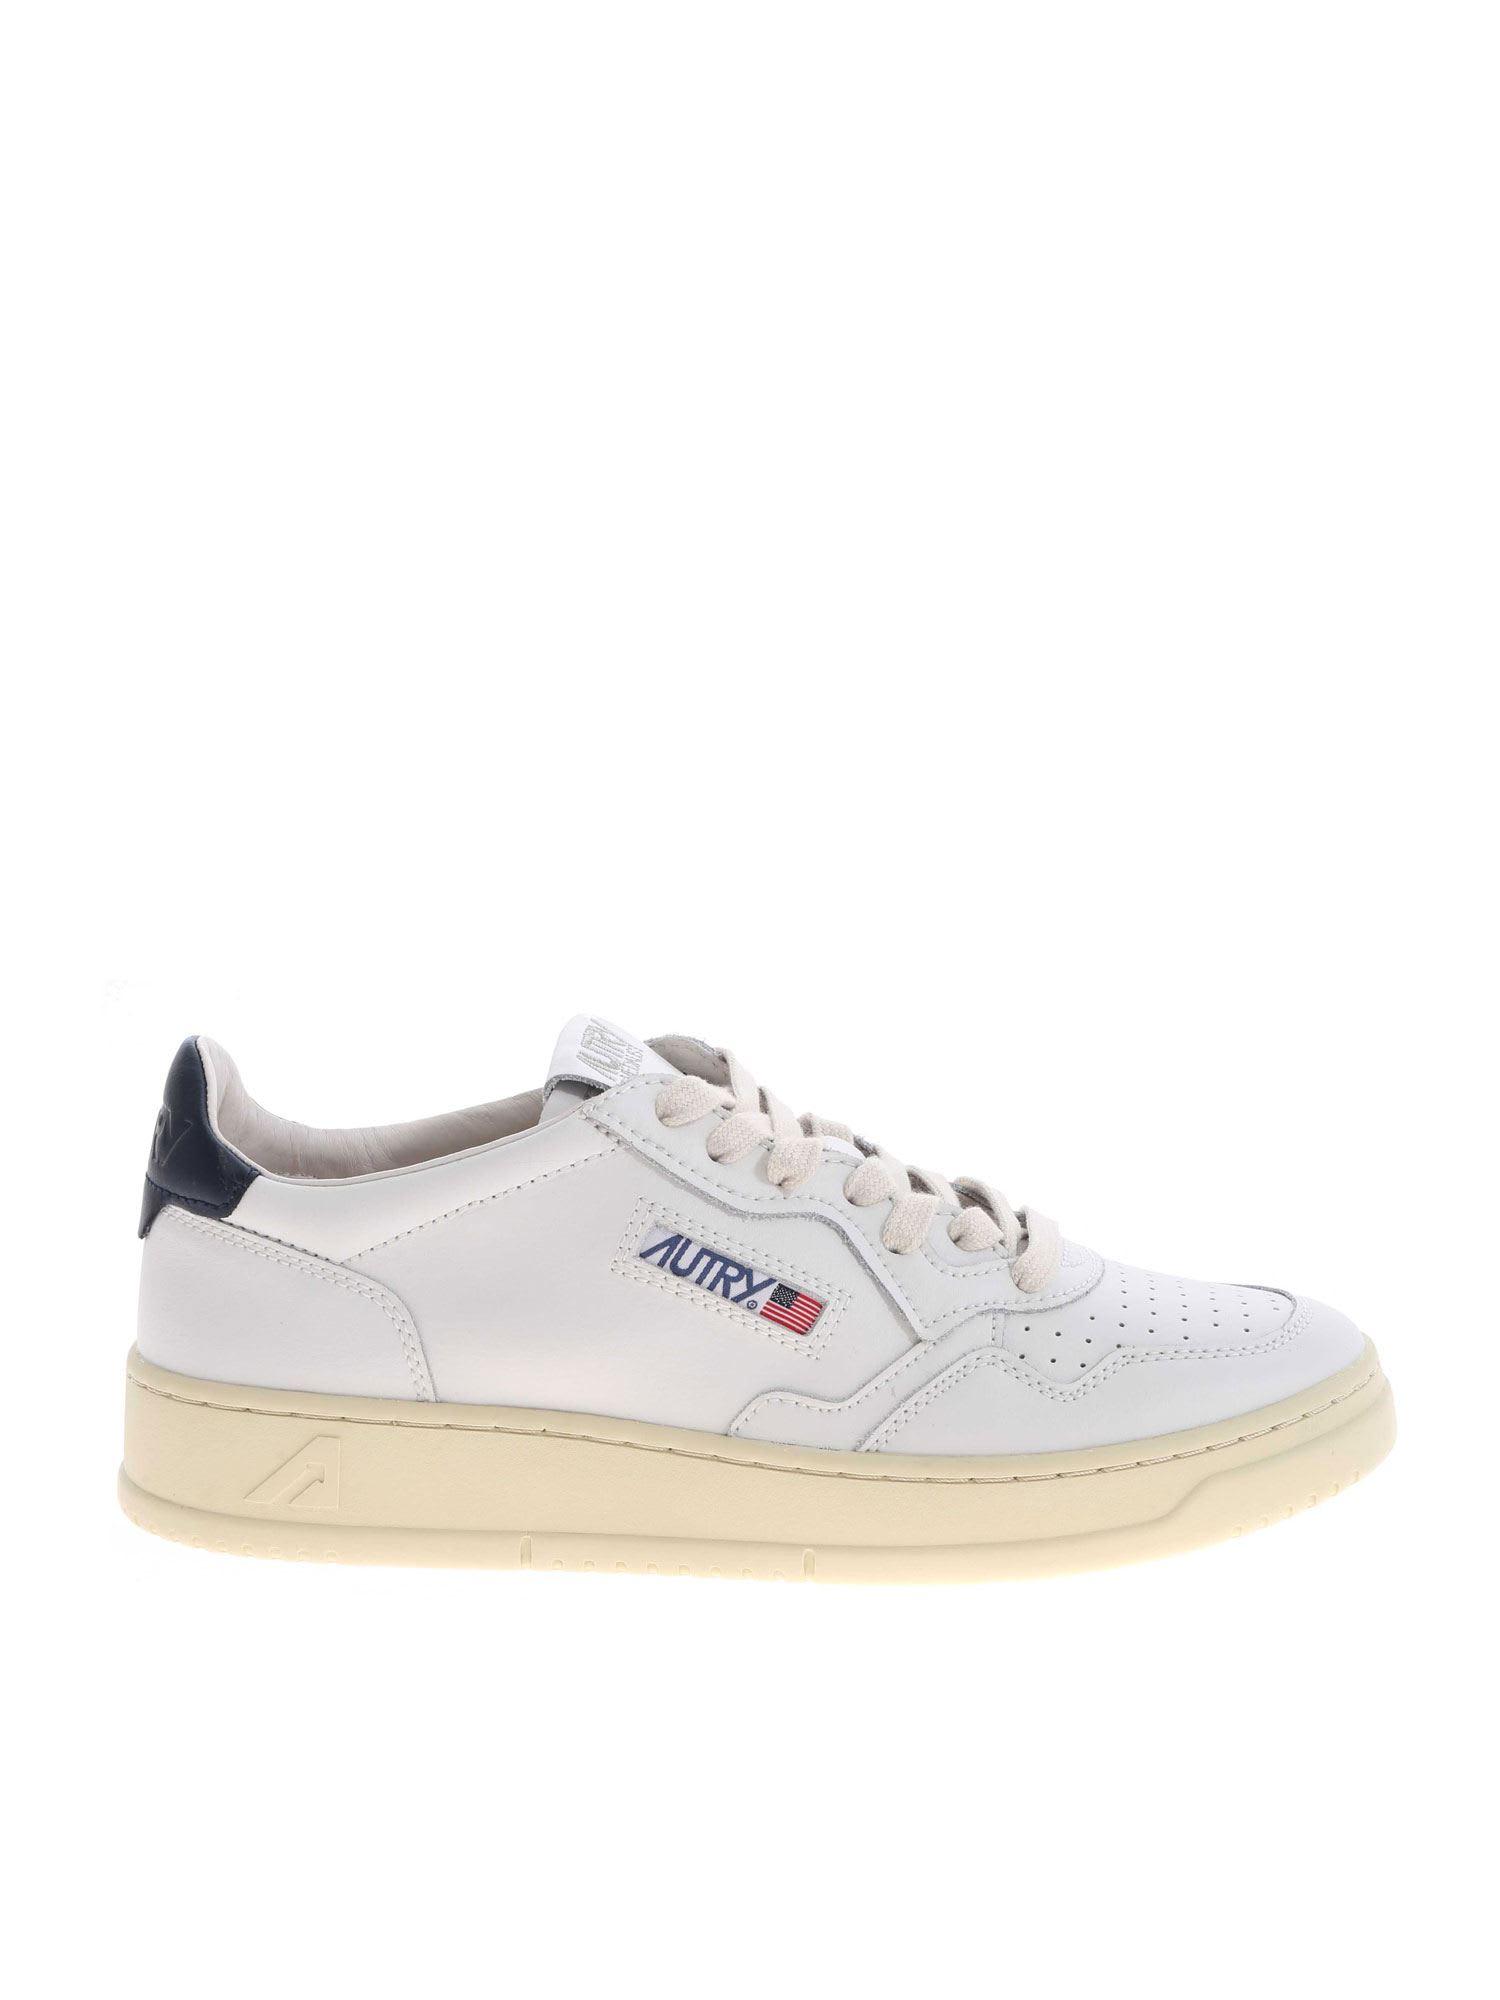 Autry Sneakers SNEAKERS